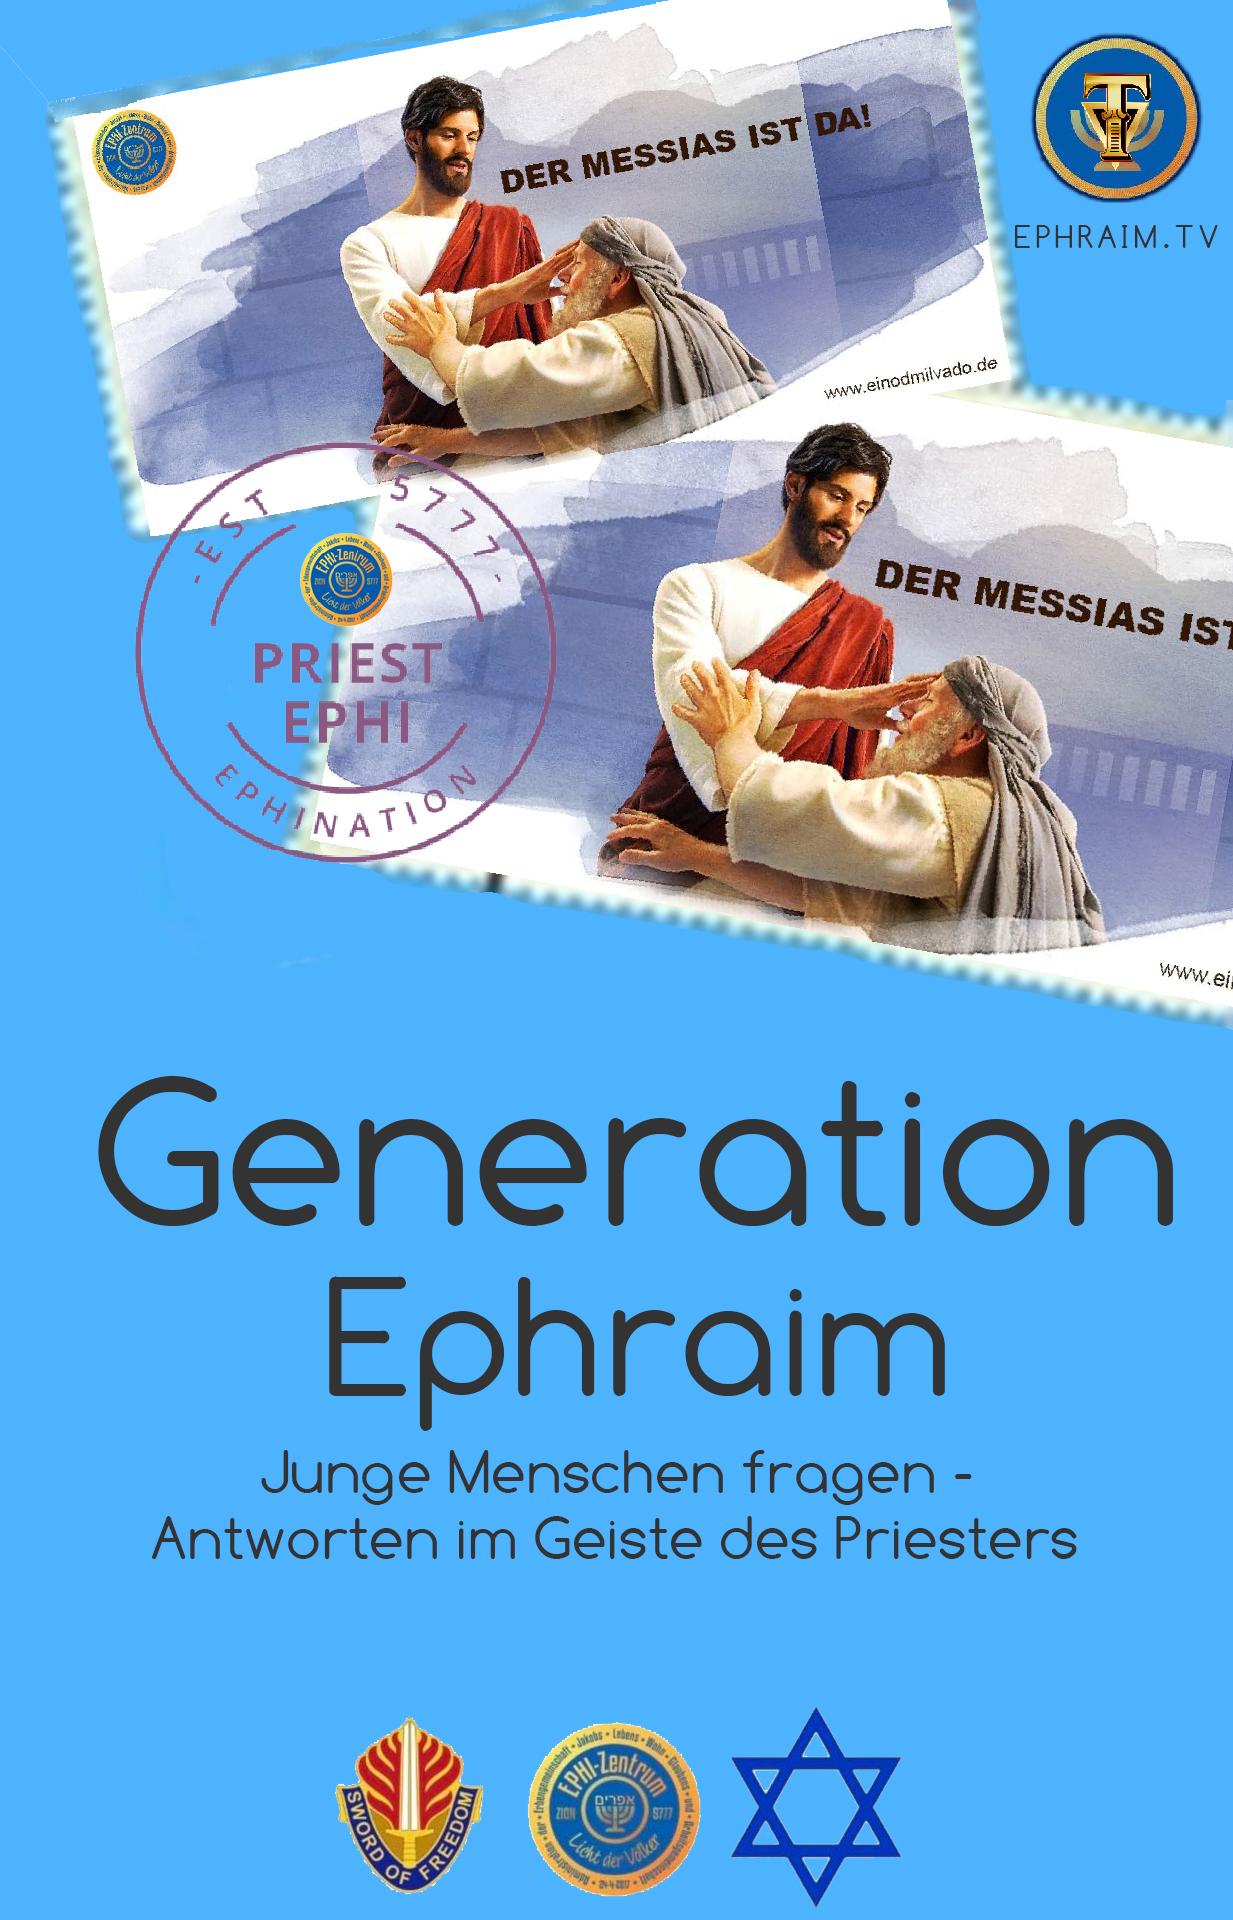 Generation Ephraim